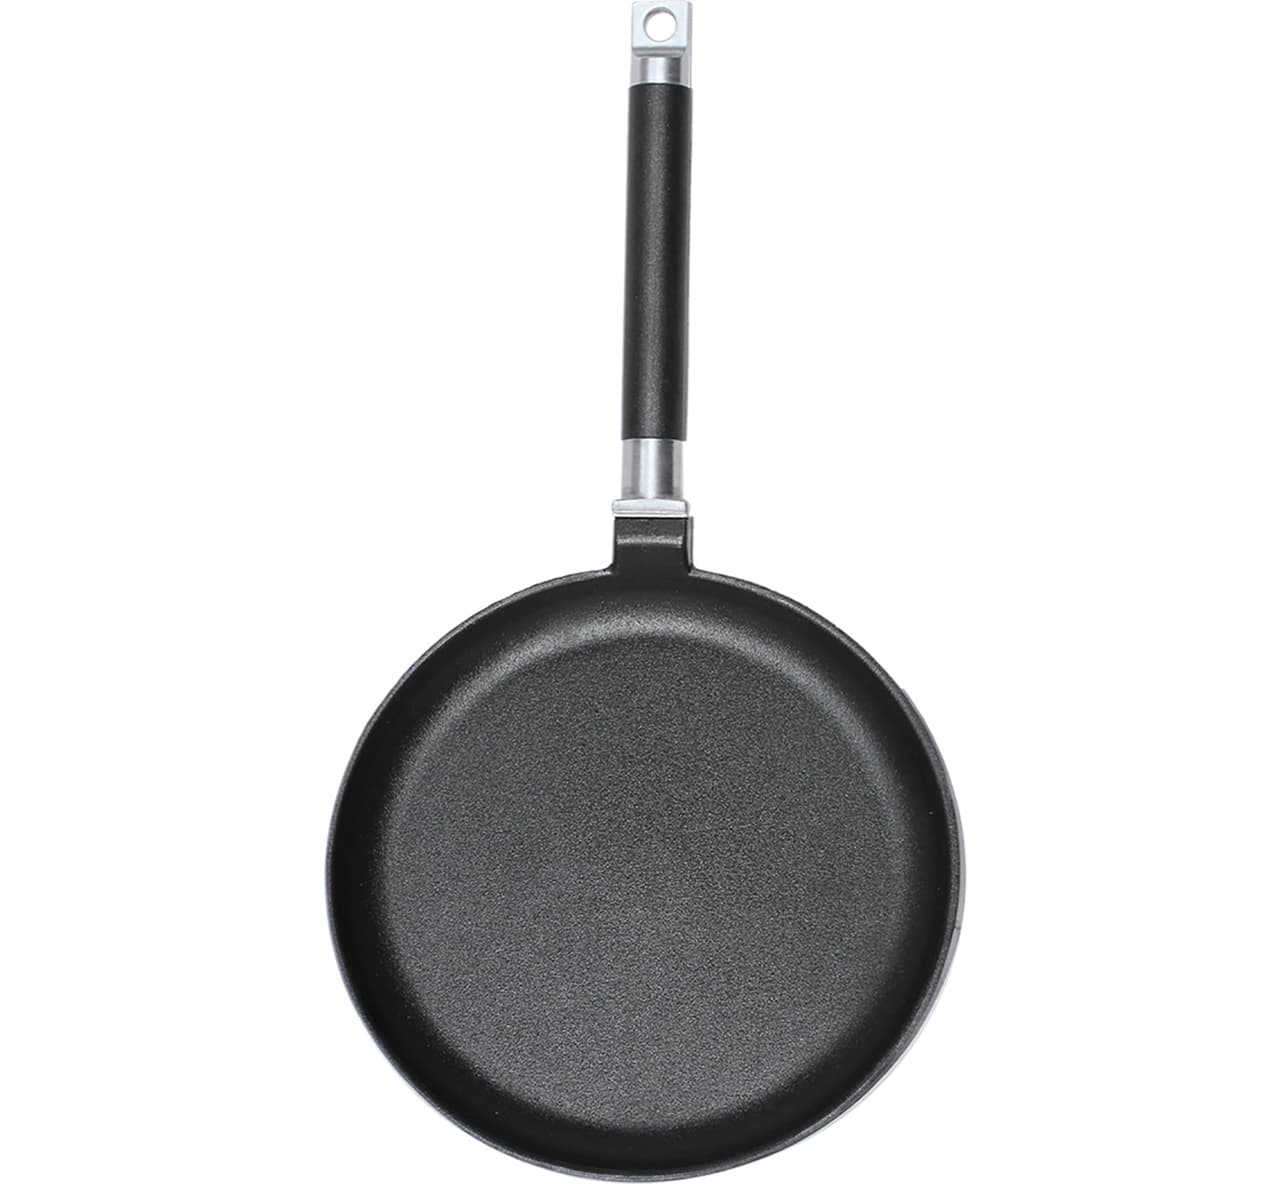 Сковорода блинная 240х20 мм. ровный борт дер.ручка БИОЛ арт.04241 - фото 4999